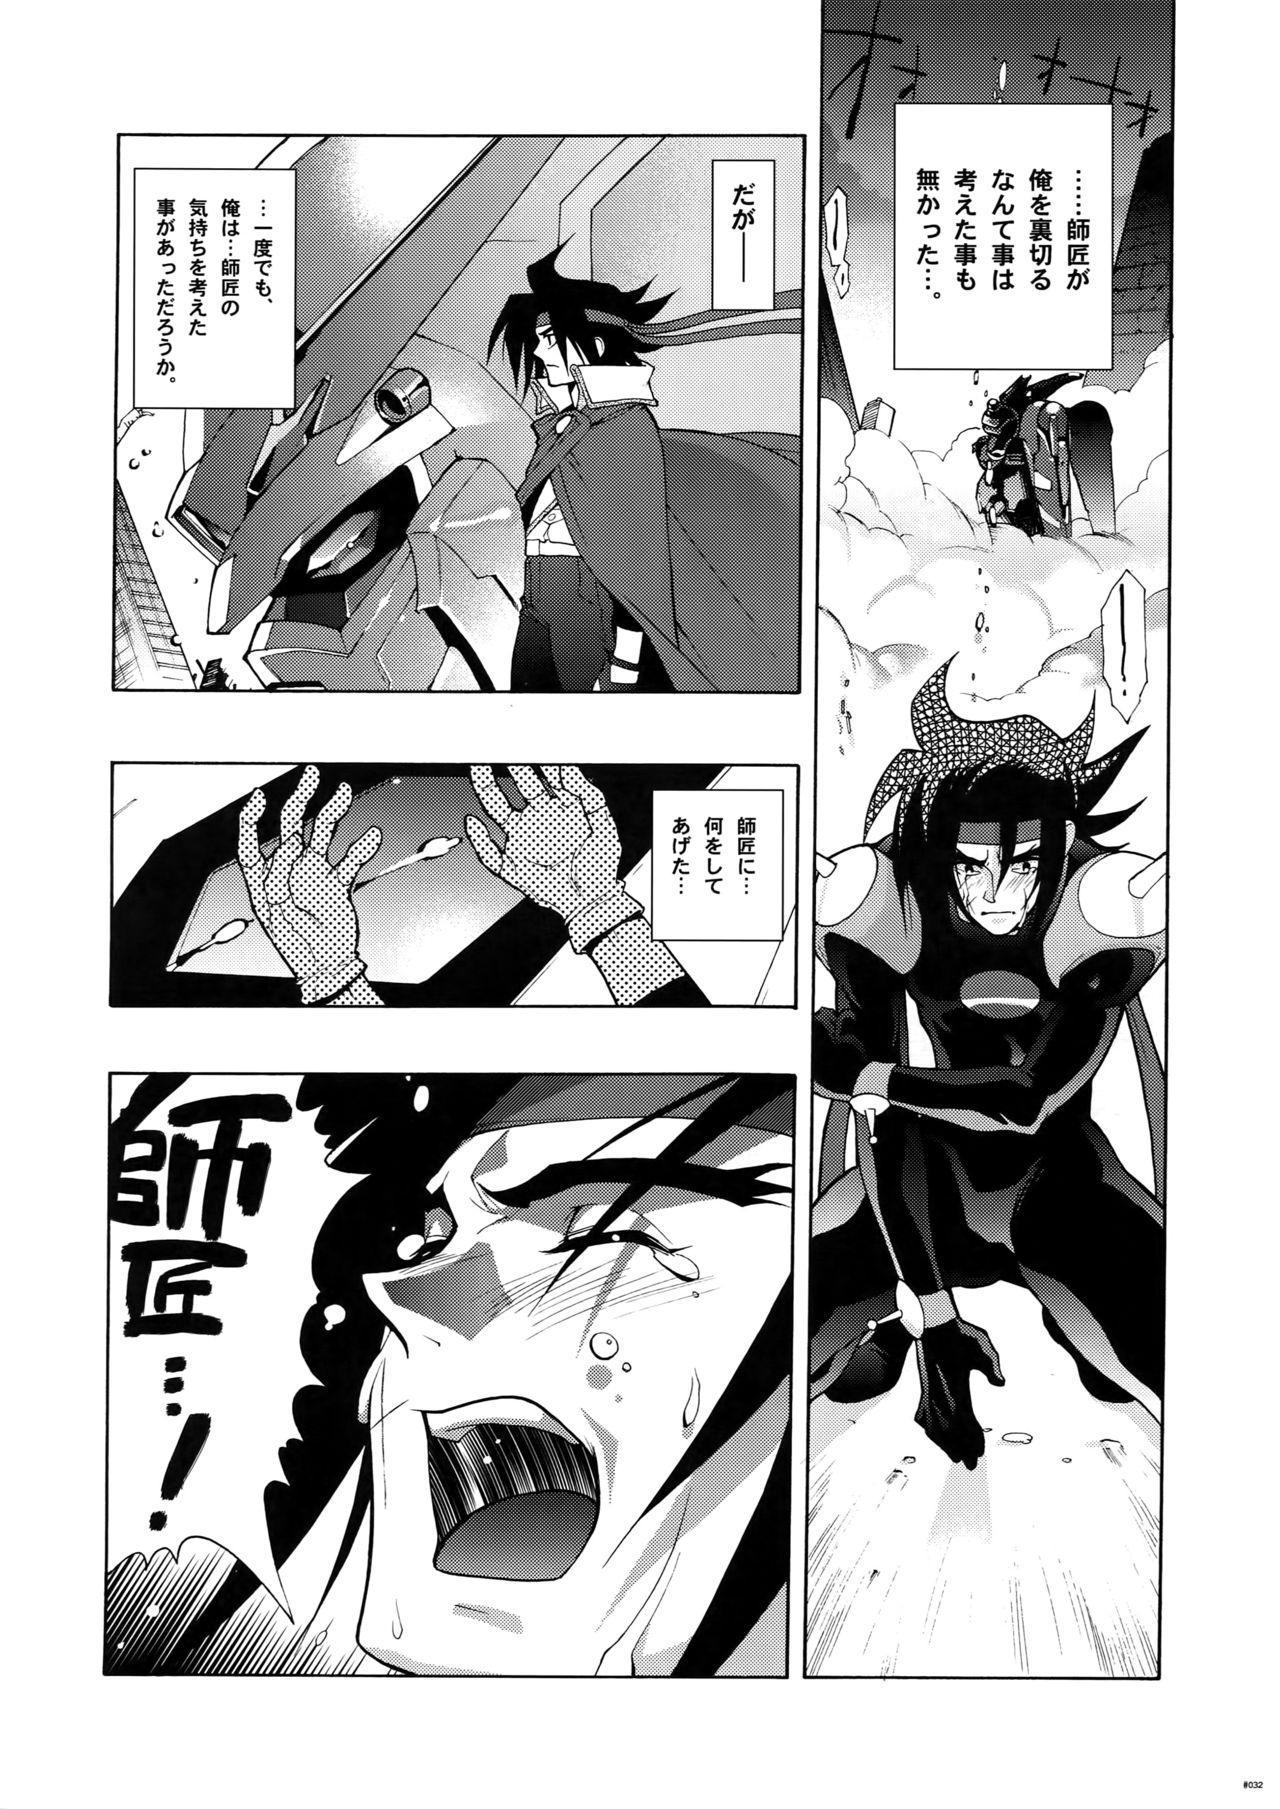 [Article 60 of Criminal Code (Shuhan)] G-gan Josei-Muke Sairoku-Shuu (G Gundam) 31